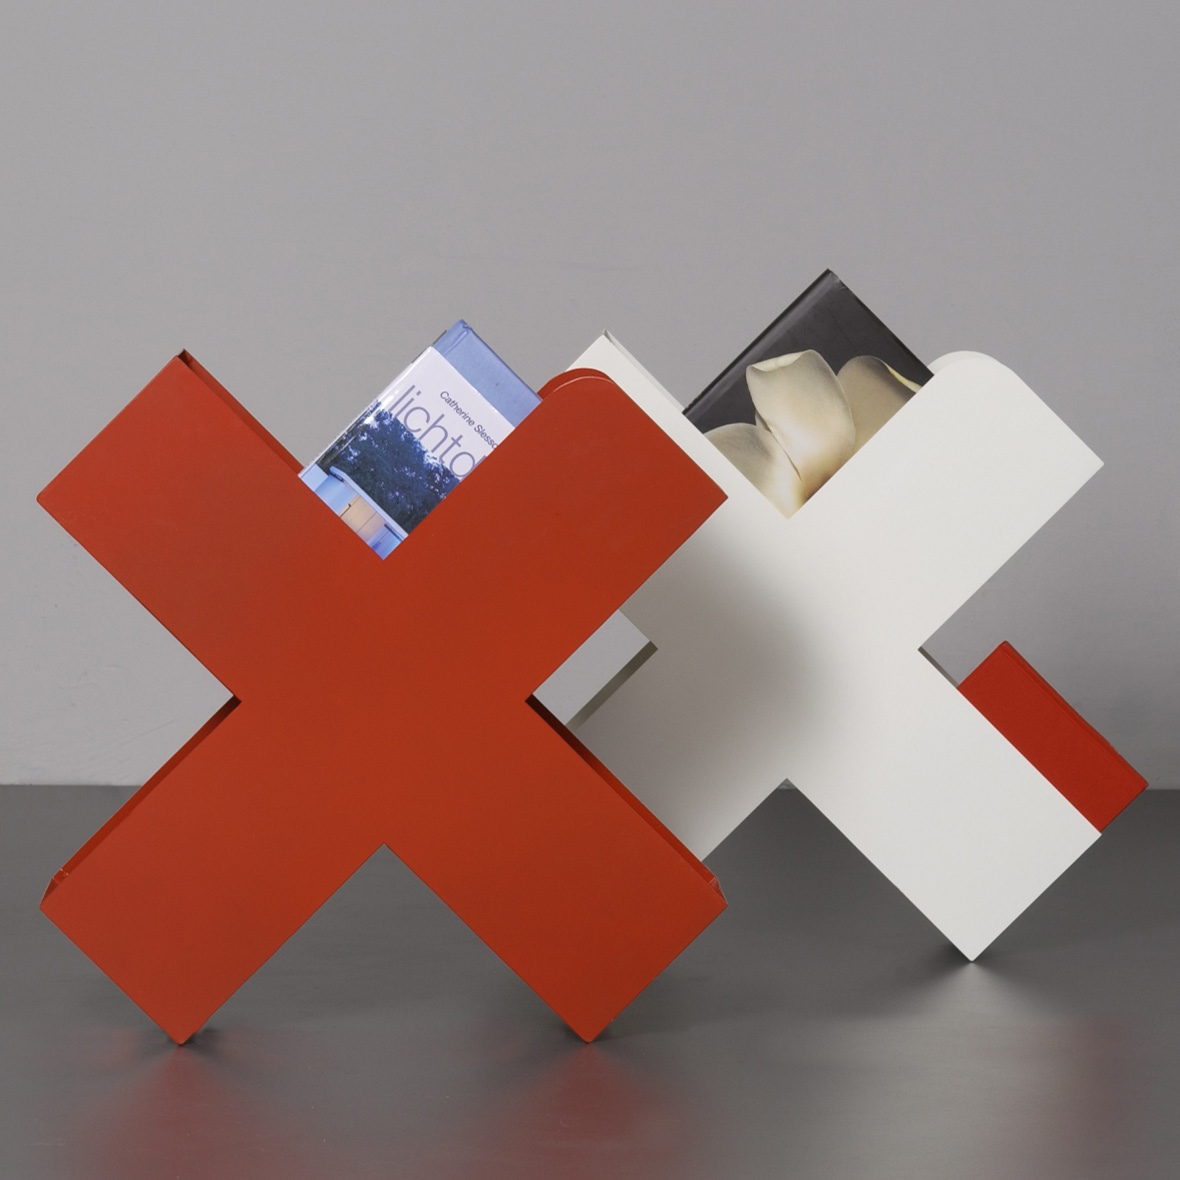 Zeitschriftenhalter Bukan stahlblech von Mox